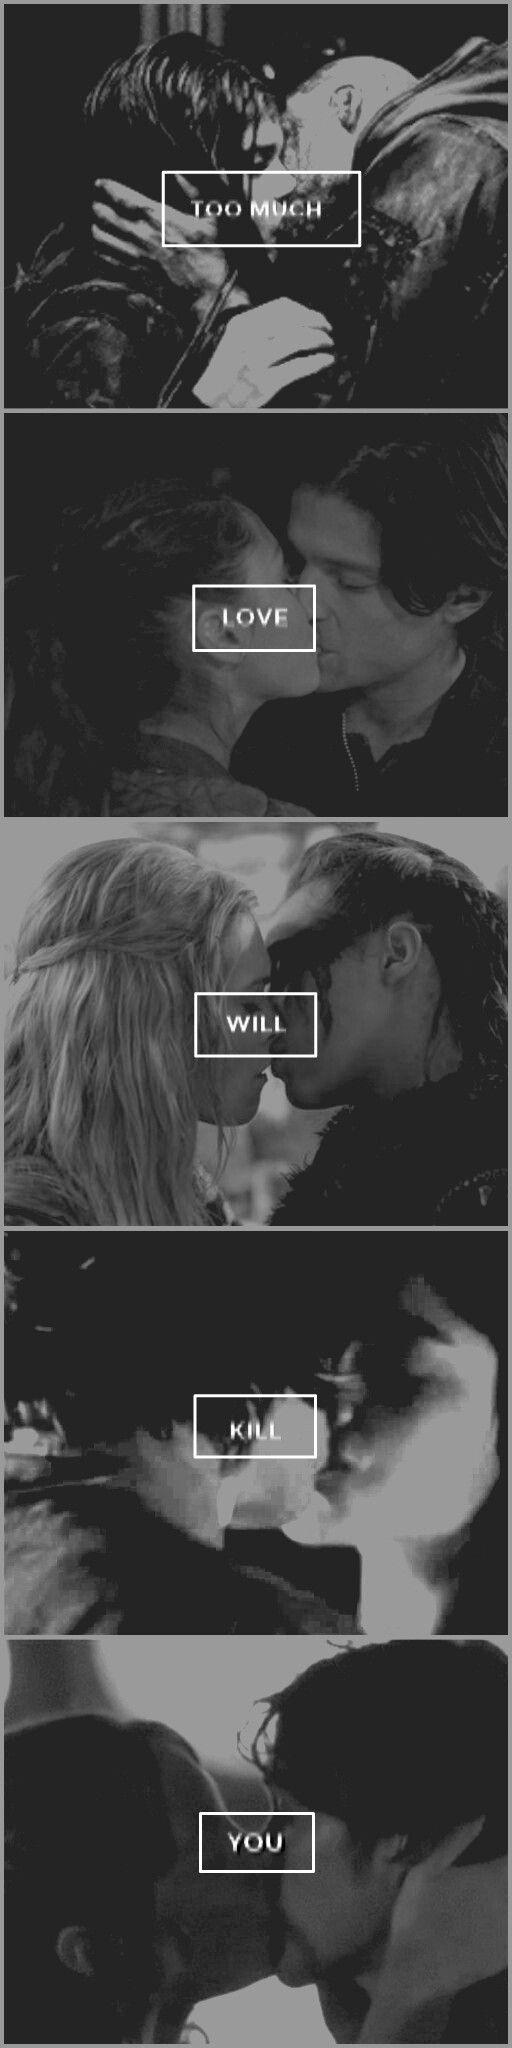 Too much love will kill you - Queen ⭐ || The 100 - Lexa - Clarke - Jasper - Maya - Lincoln - Octavia - Finn - Raven - Bellamy - Gina || Quality RIP :)